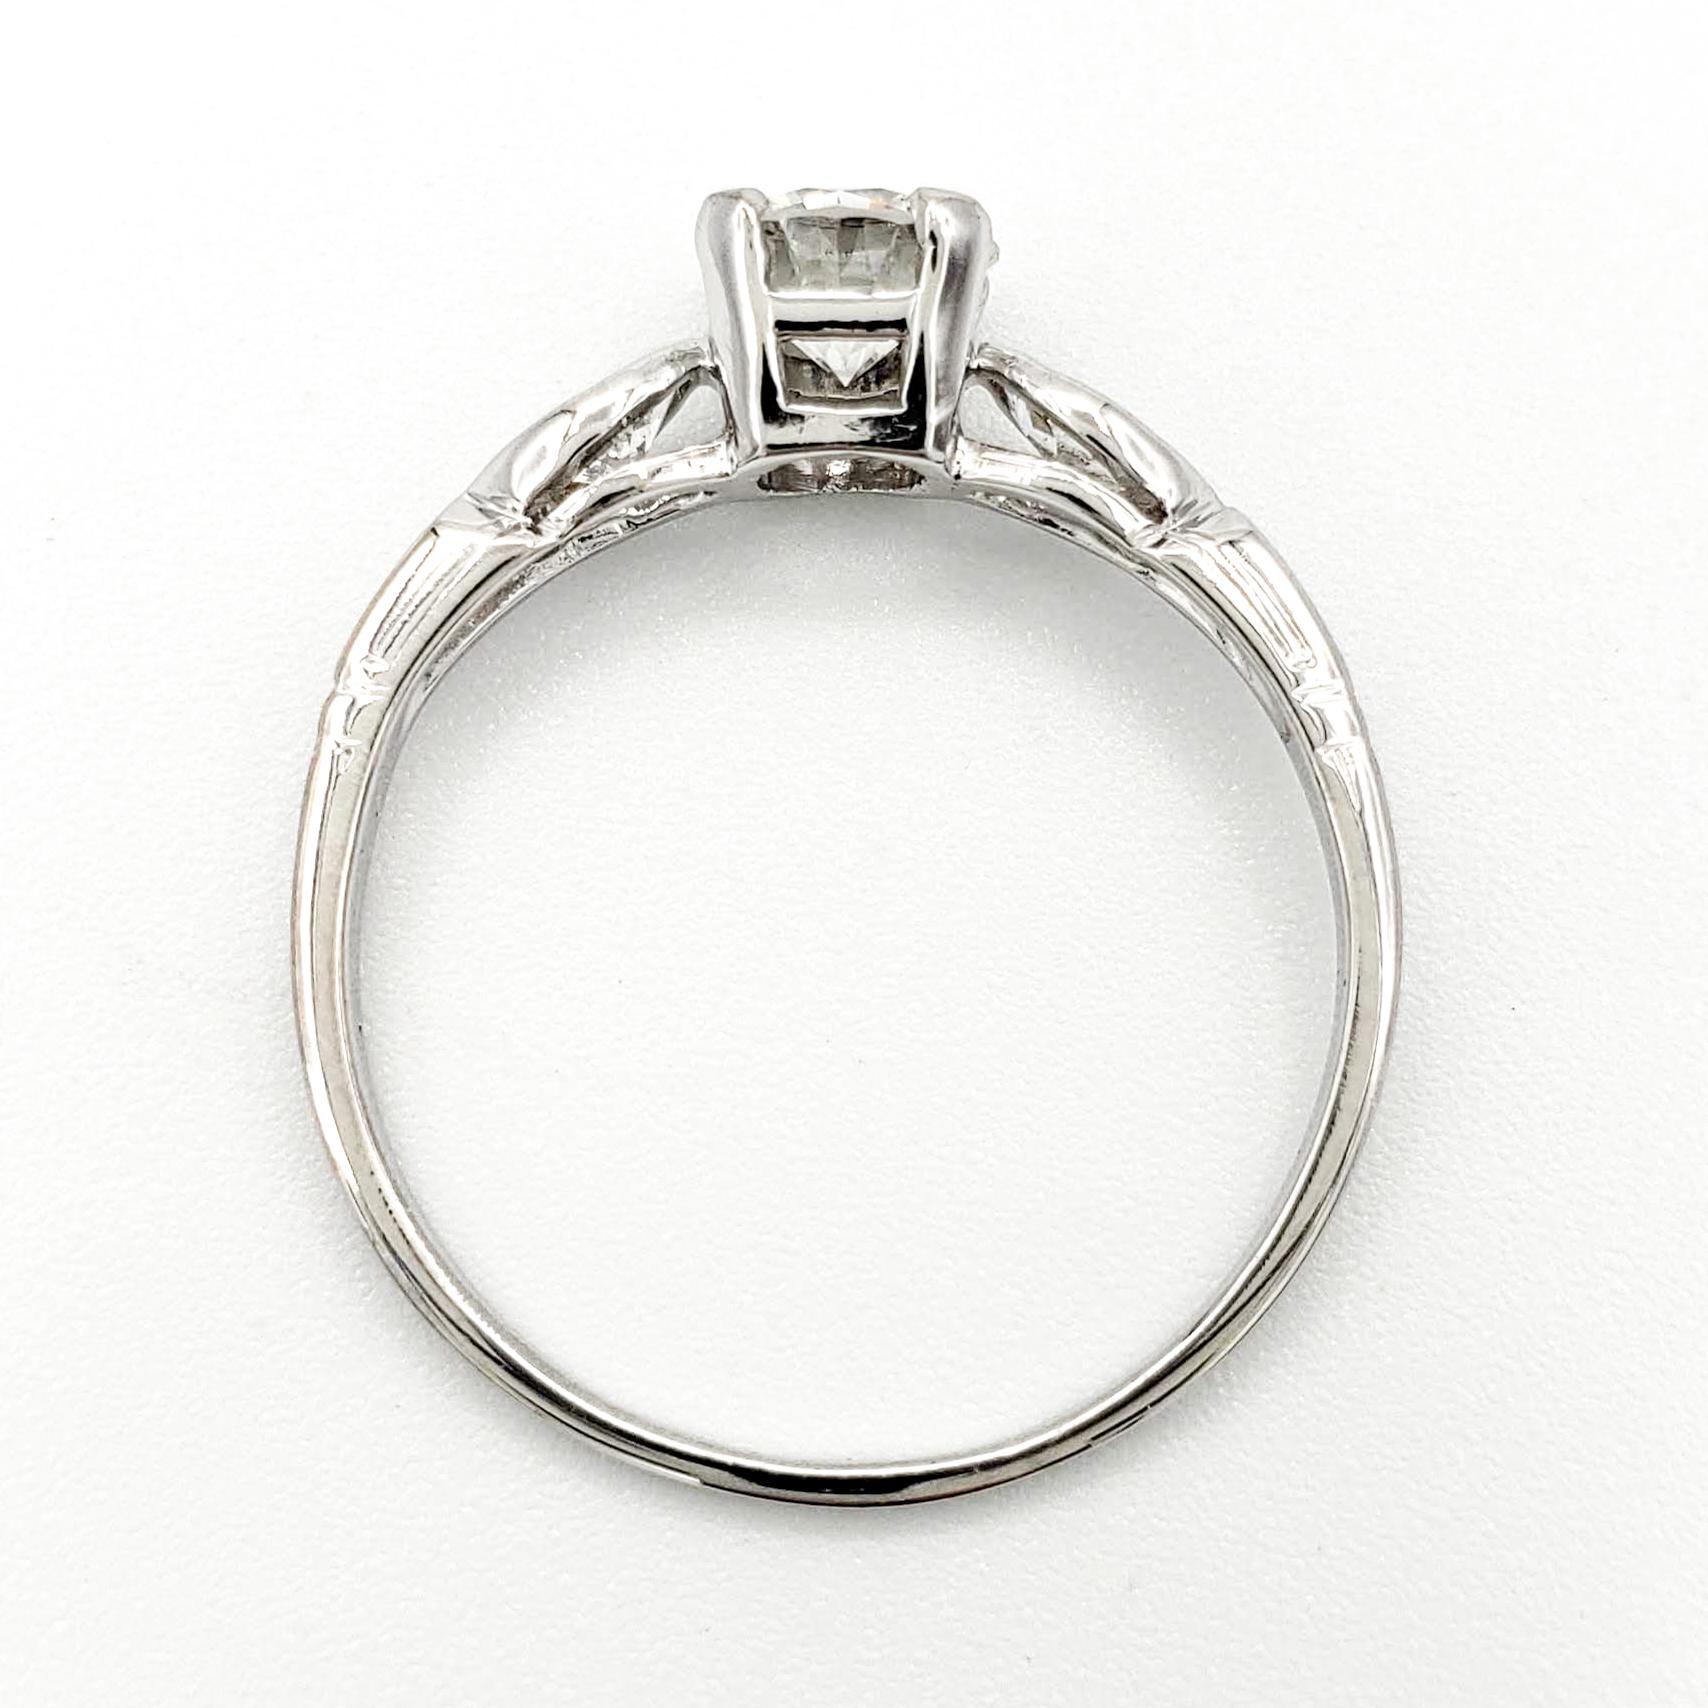 vintage-platinum-engagement-ring-with-0-56-carat-round-brilliant-cut-diamond-gia-g-vs2